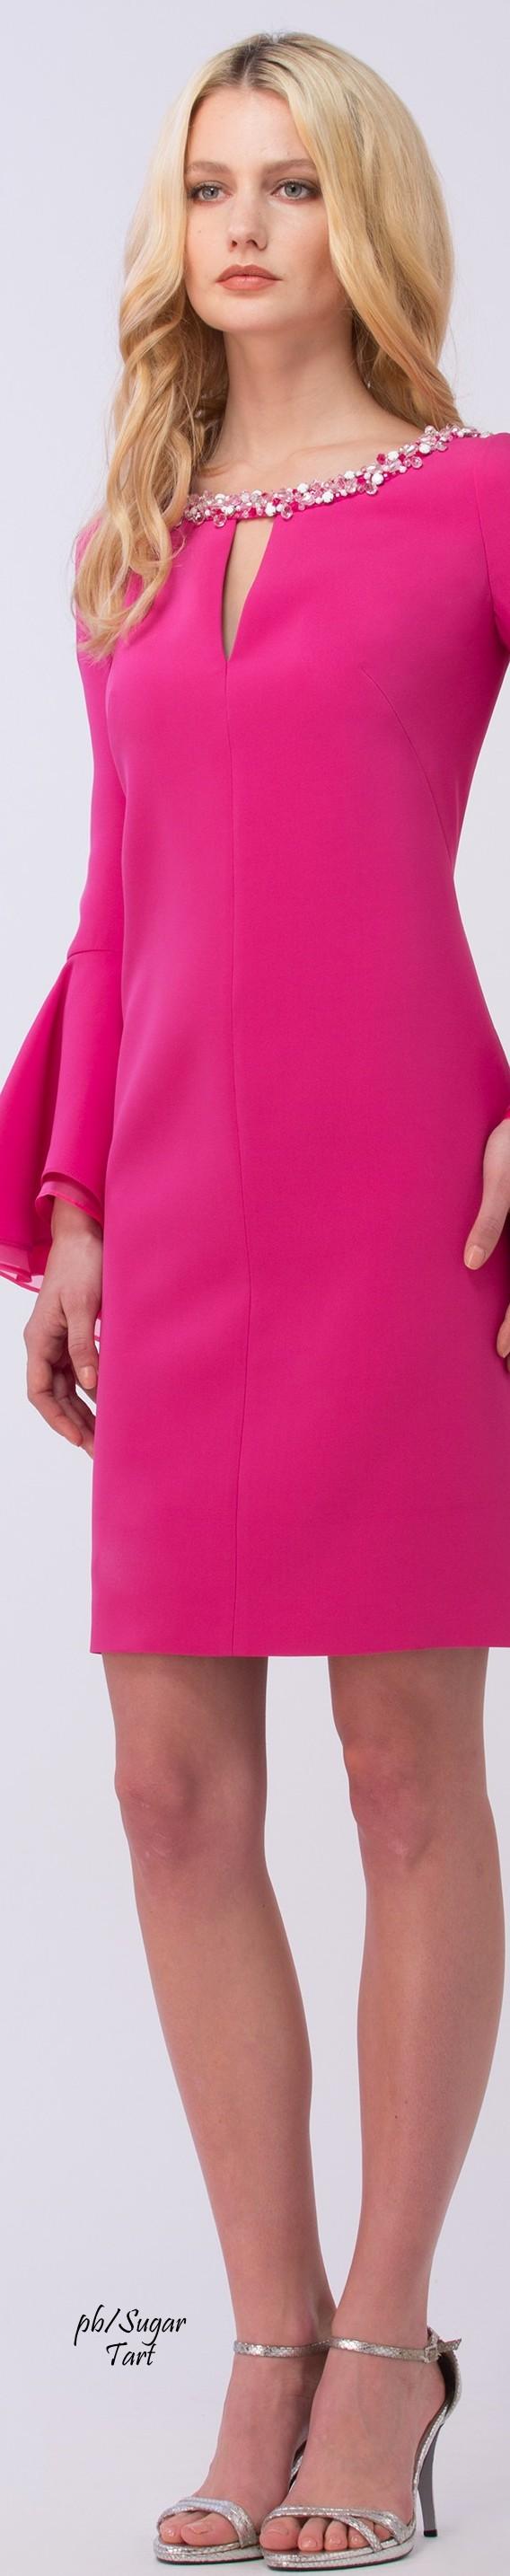 Luisa Spagnoli FW 15-16   Zara   Pinterest   Diseño moderno, Moderno ...